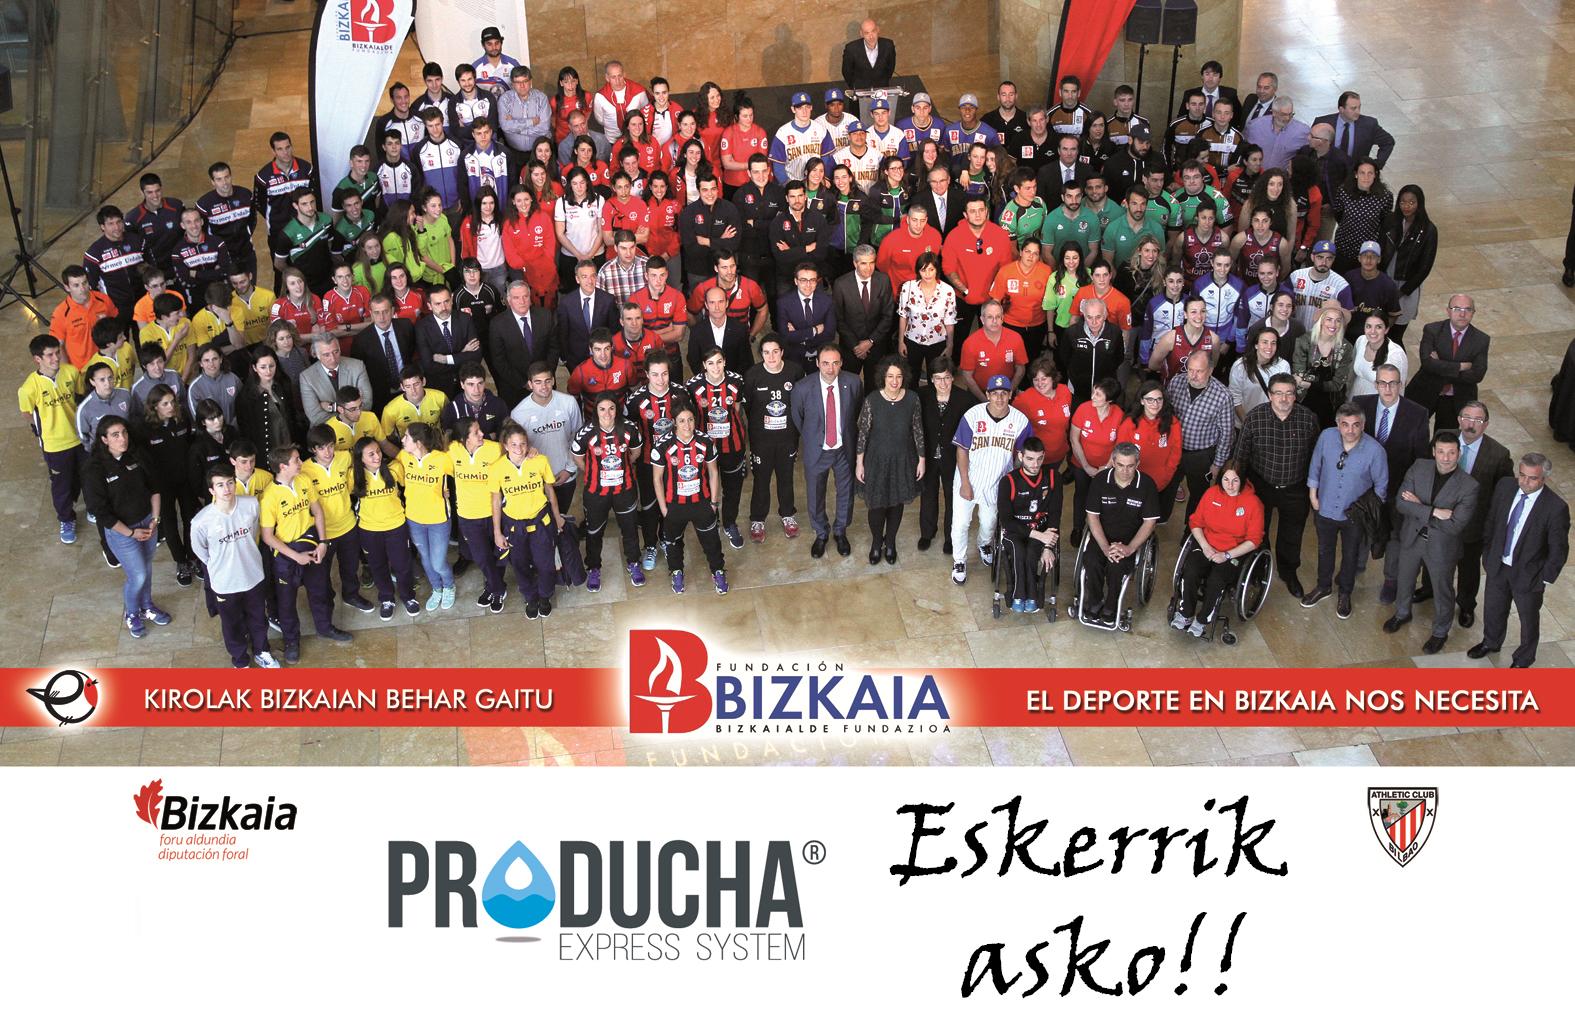 Producha patrocinador deporte bizkaia